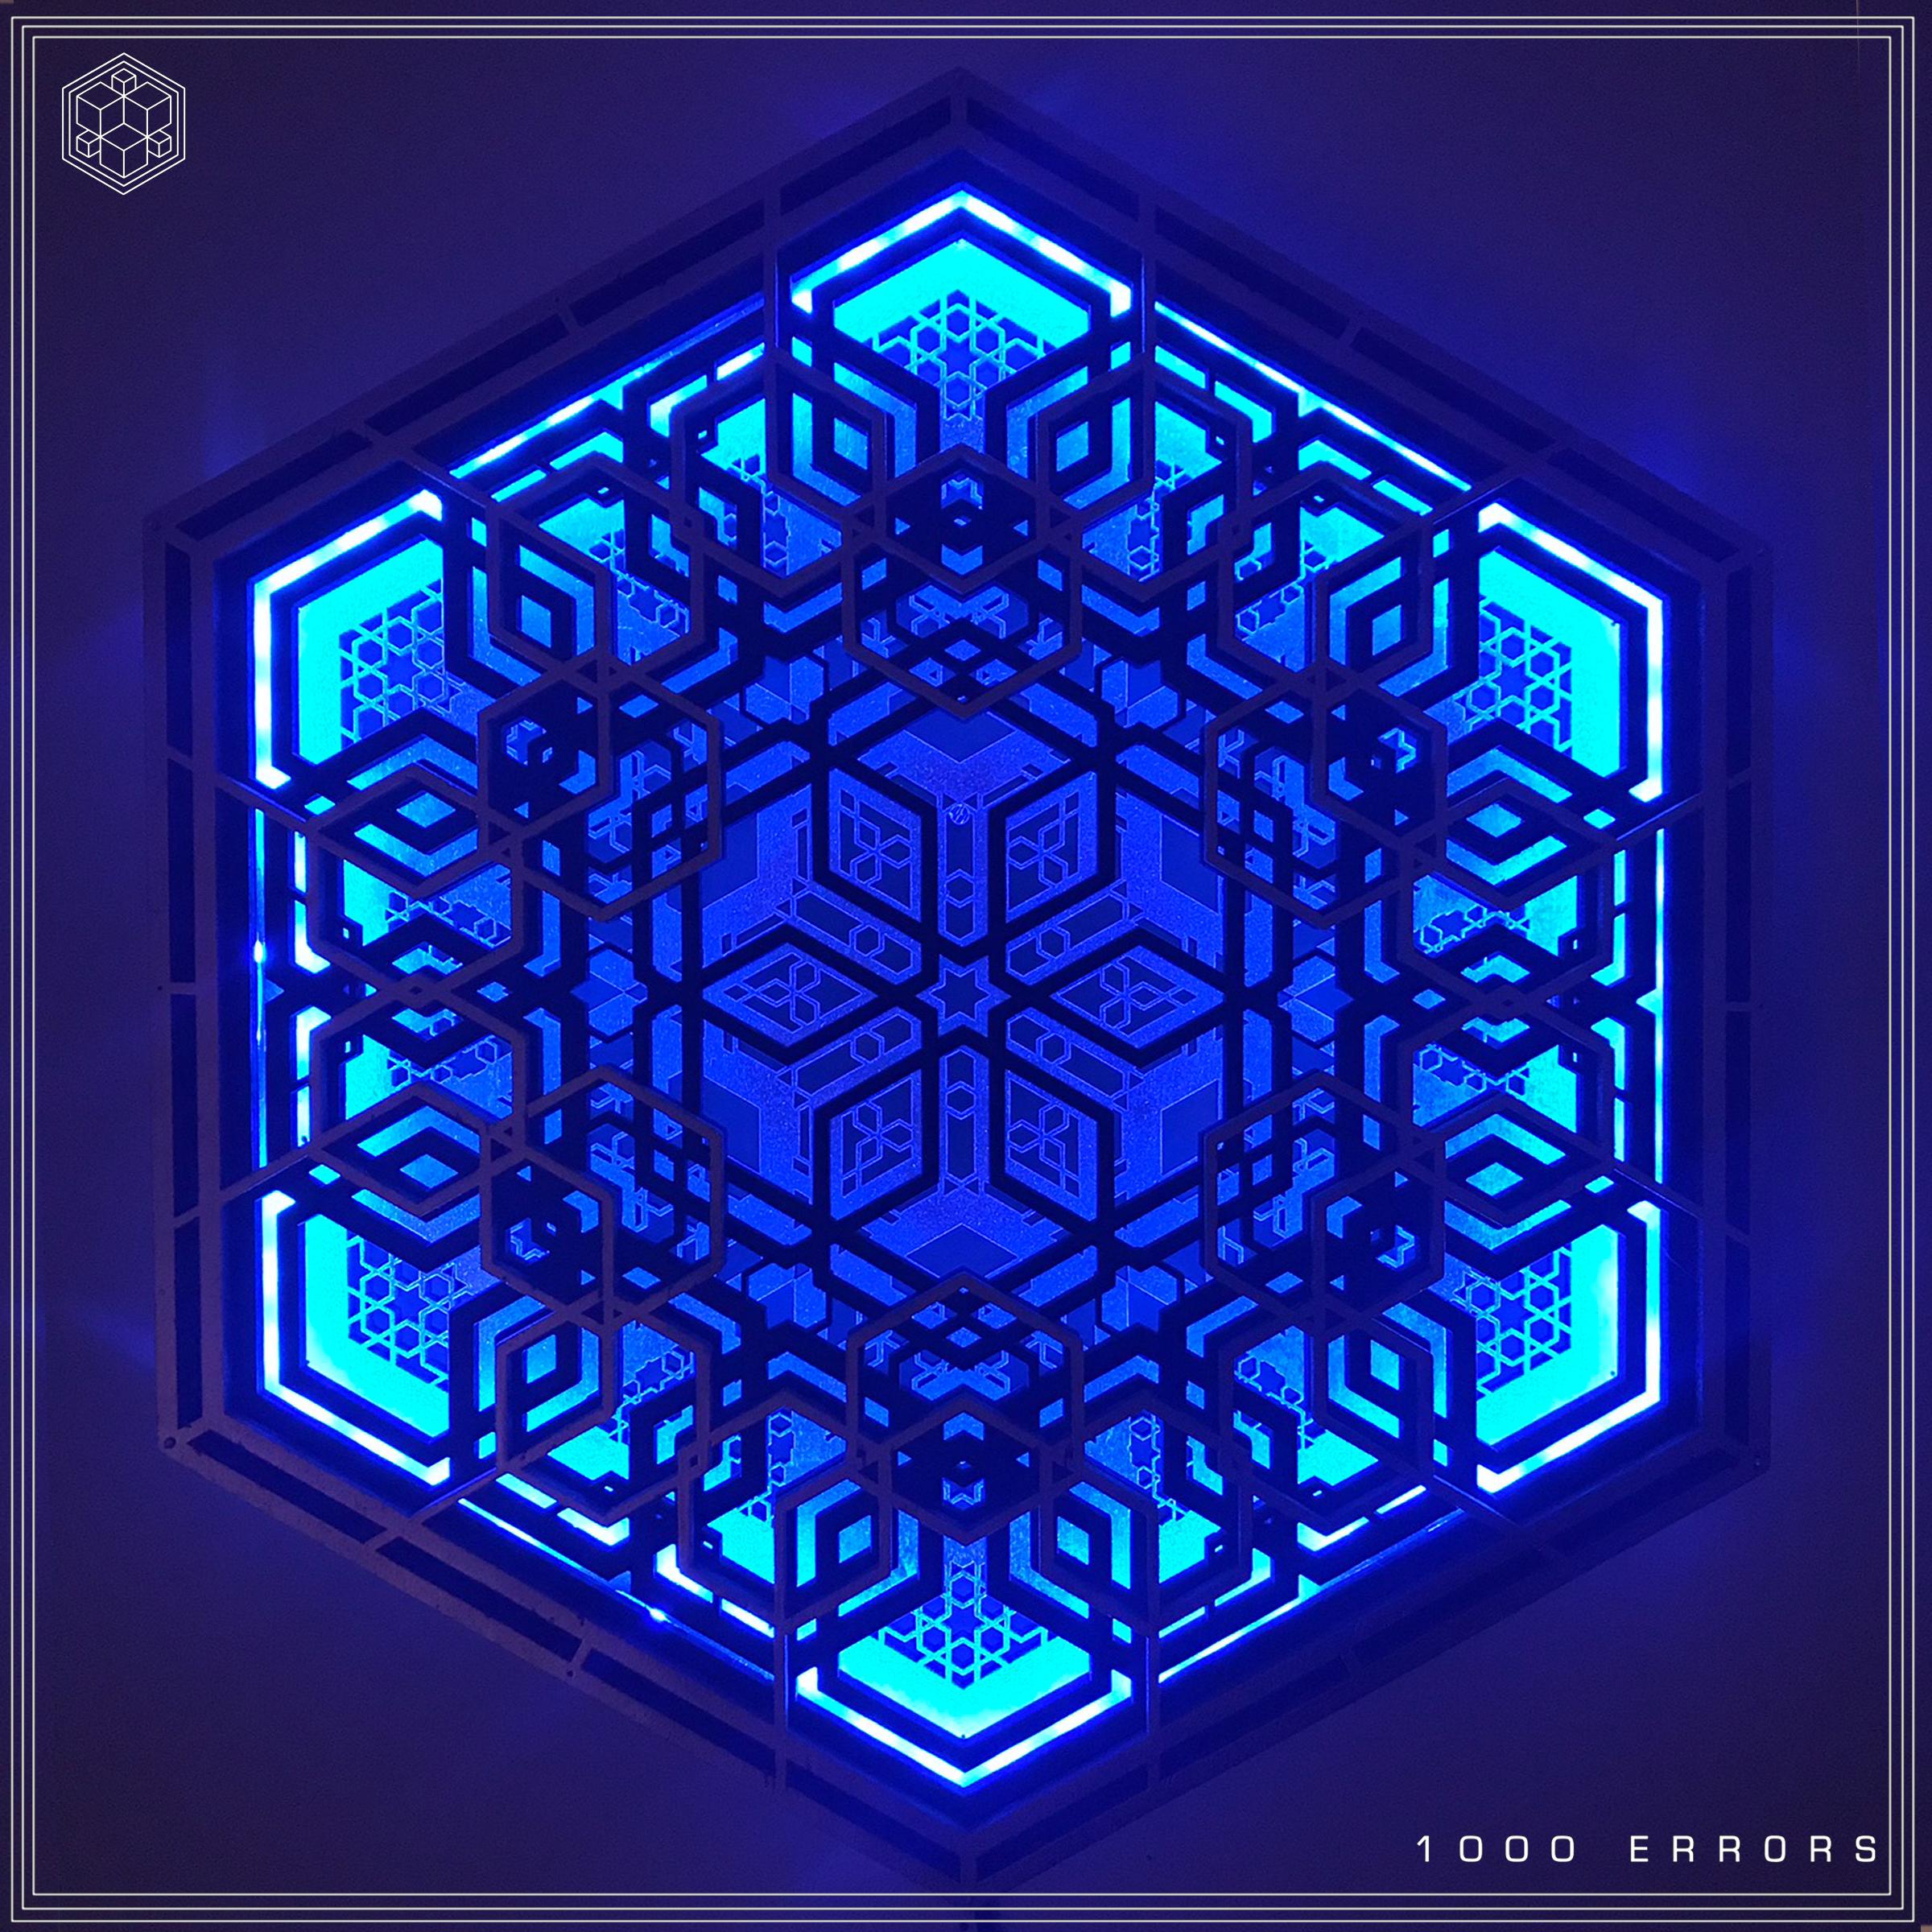 Geometric, wood, woodwork, cnc, cad, maya, rhino, procedural, generative, geometry, sacred,hexagon, platonic, solid, psy, psychedelic, art, clock, shop, buy, sale, store, discount,metaphysical, spiritual, new48 .jpg